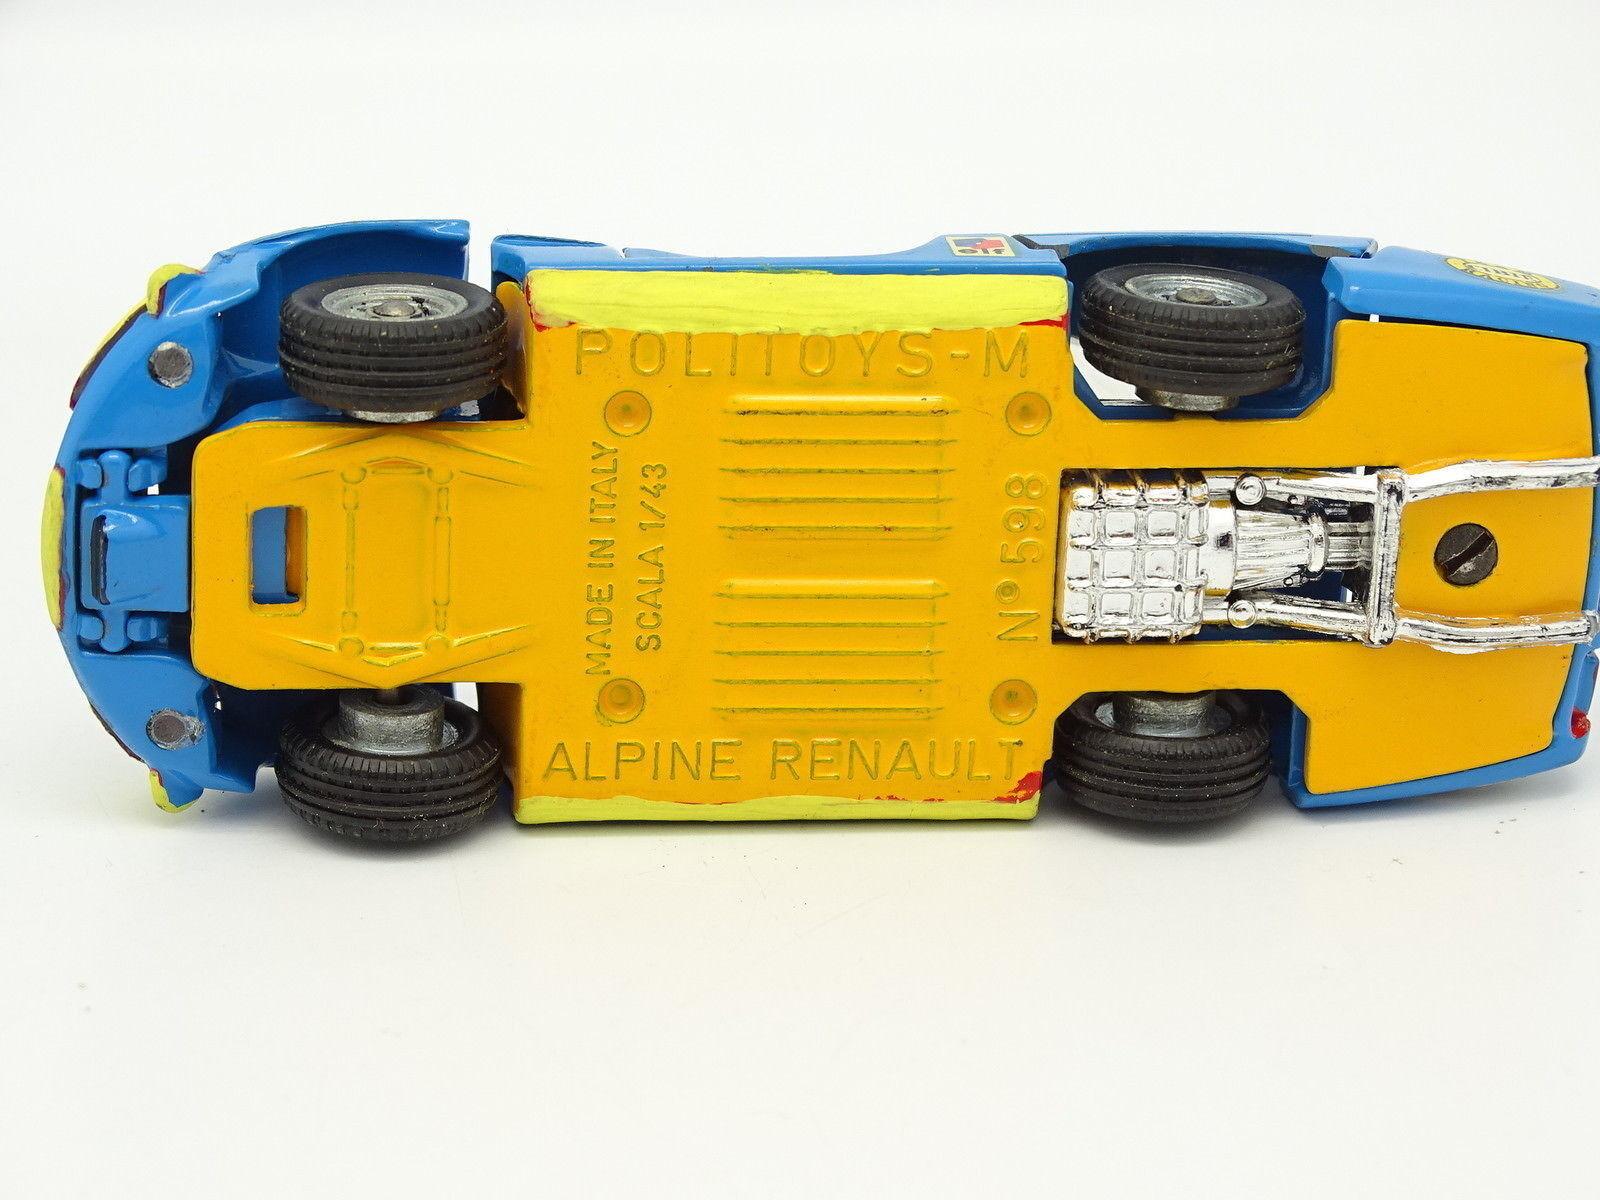 Politoys SB 1 1 1 43 - Alpine Renault A220 3L Nº3 b1c616